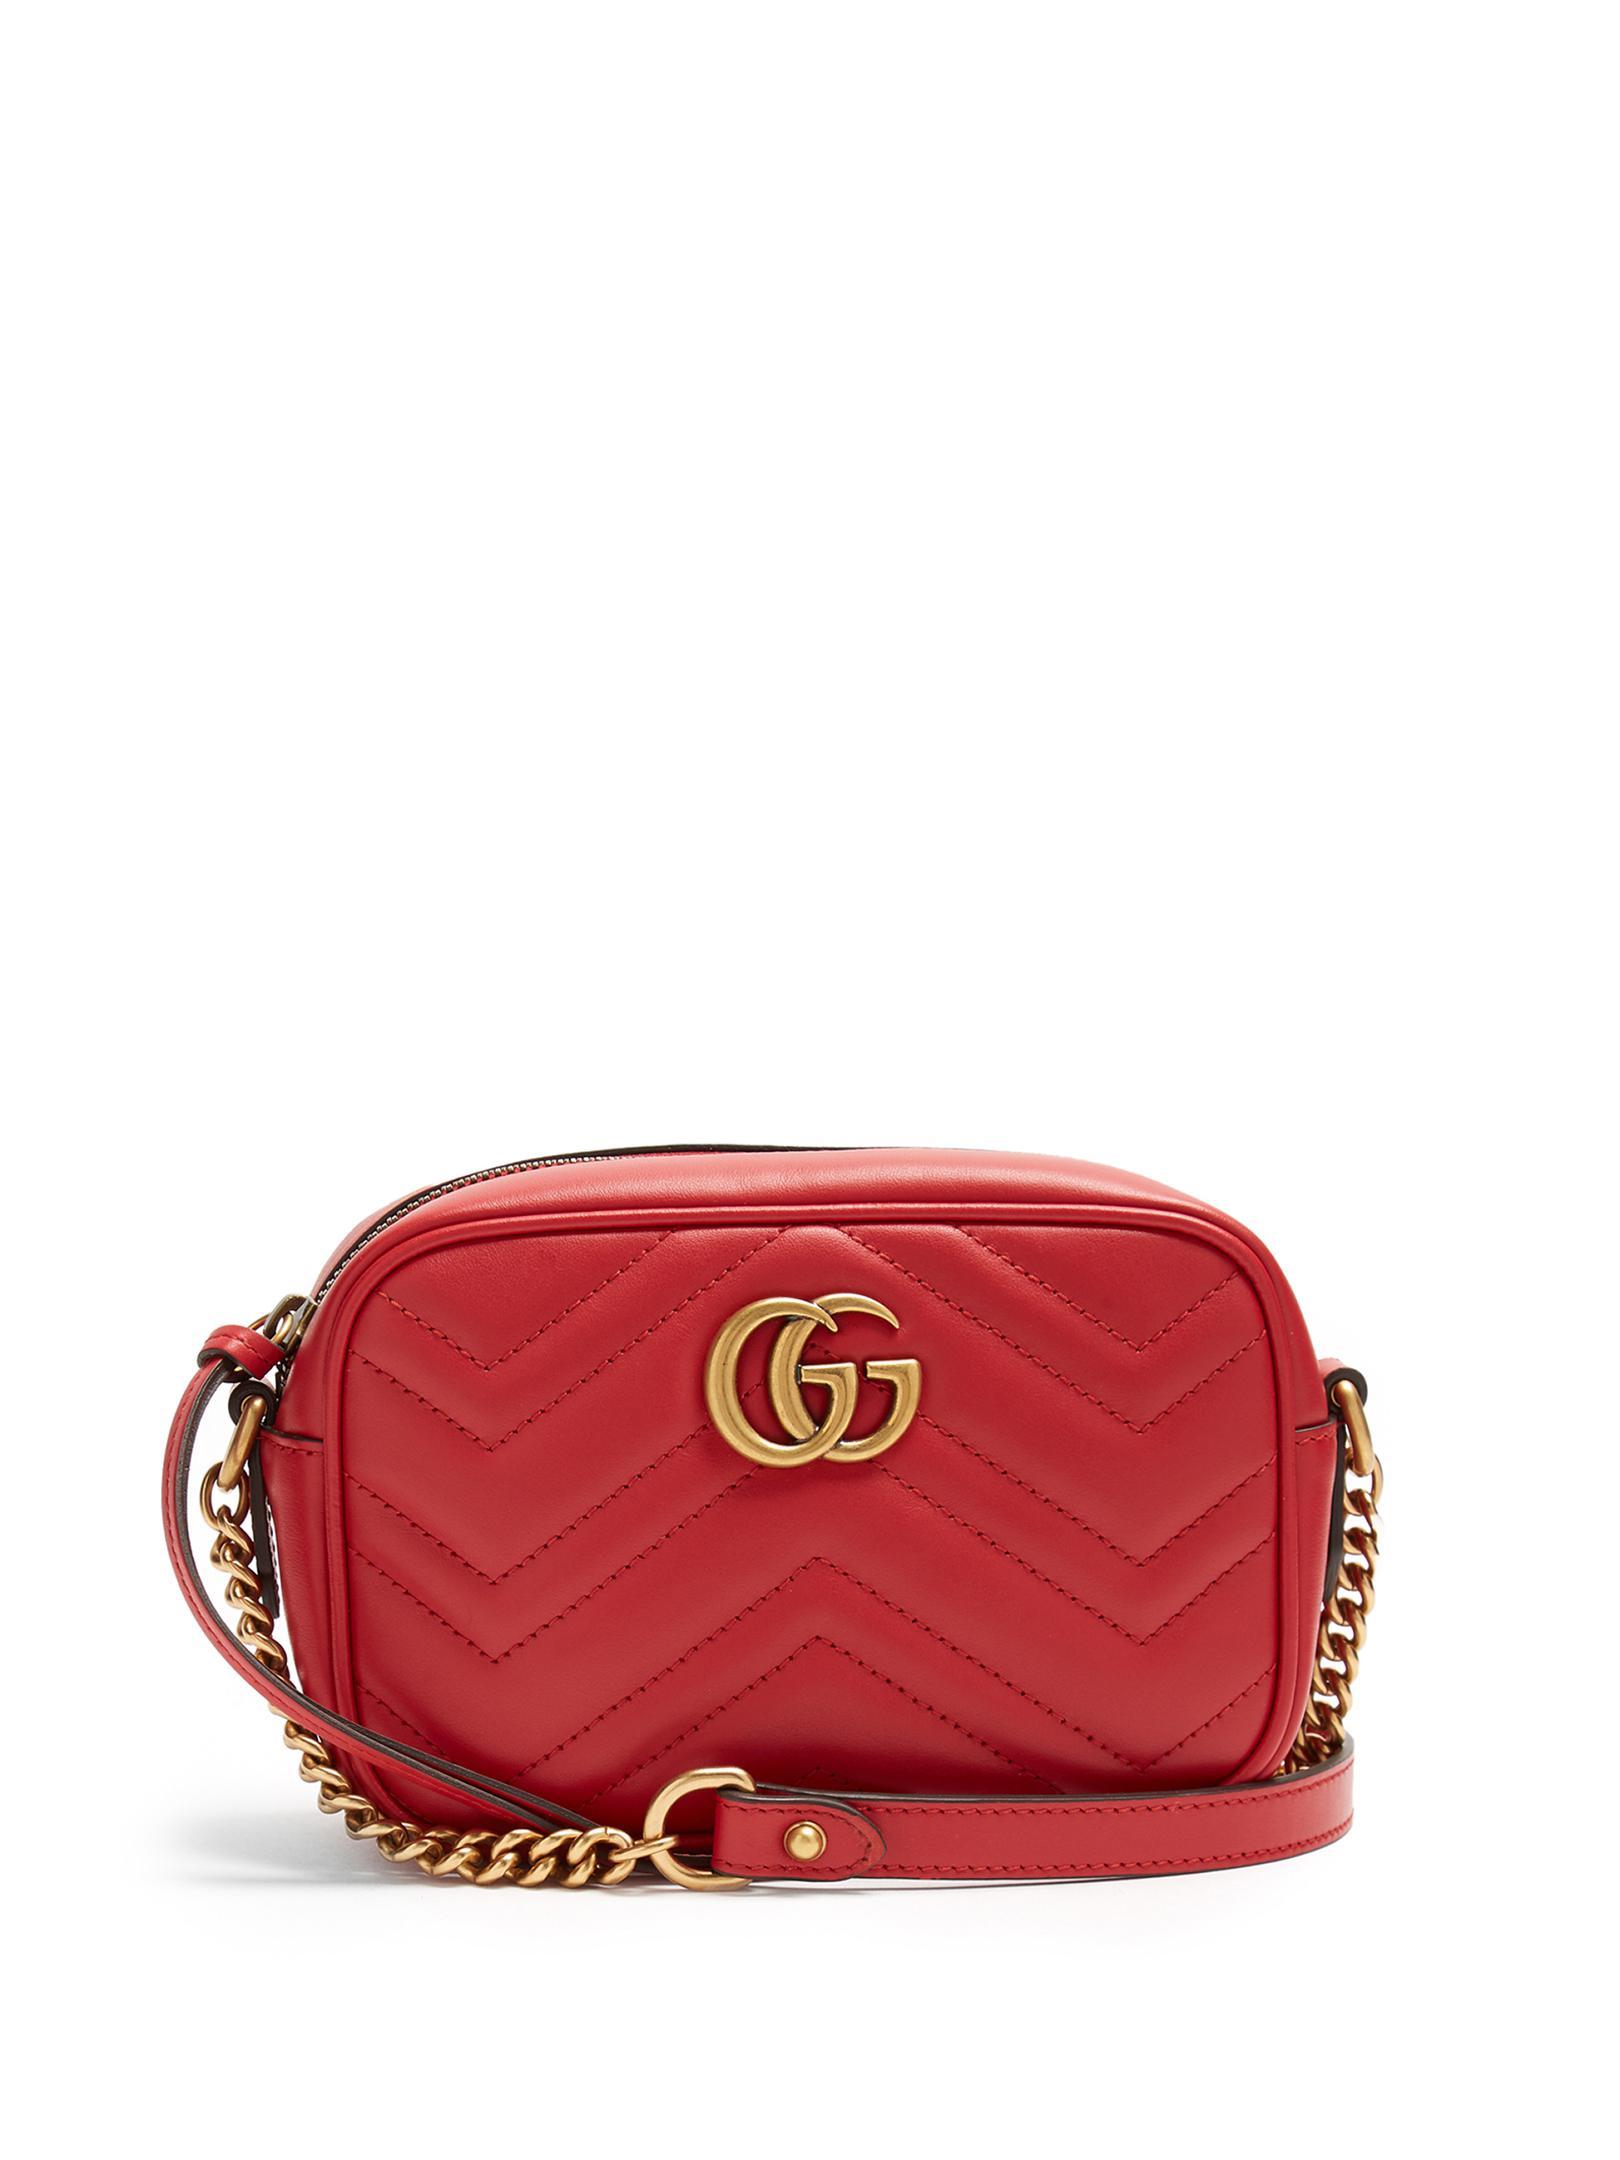 575c9c27e65d Gucci Marmont Mini Shoulder Bag Uk | Stanford Center for Opportunity ...